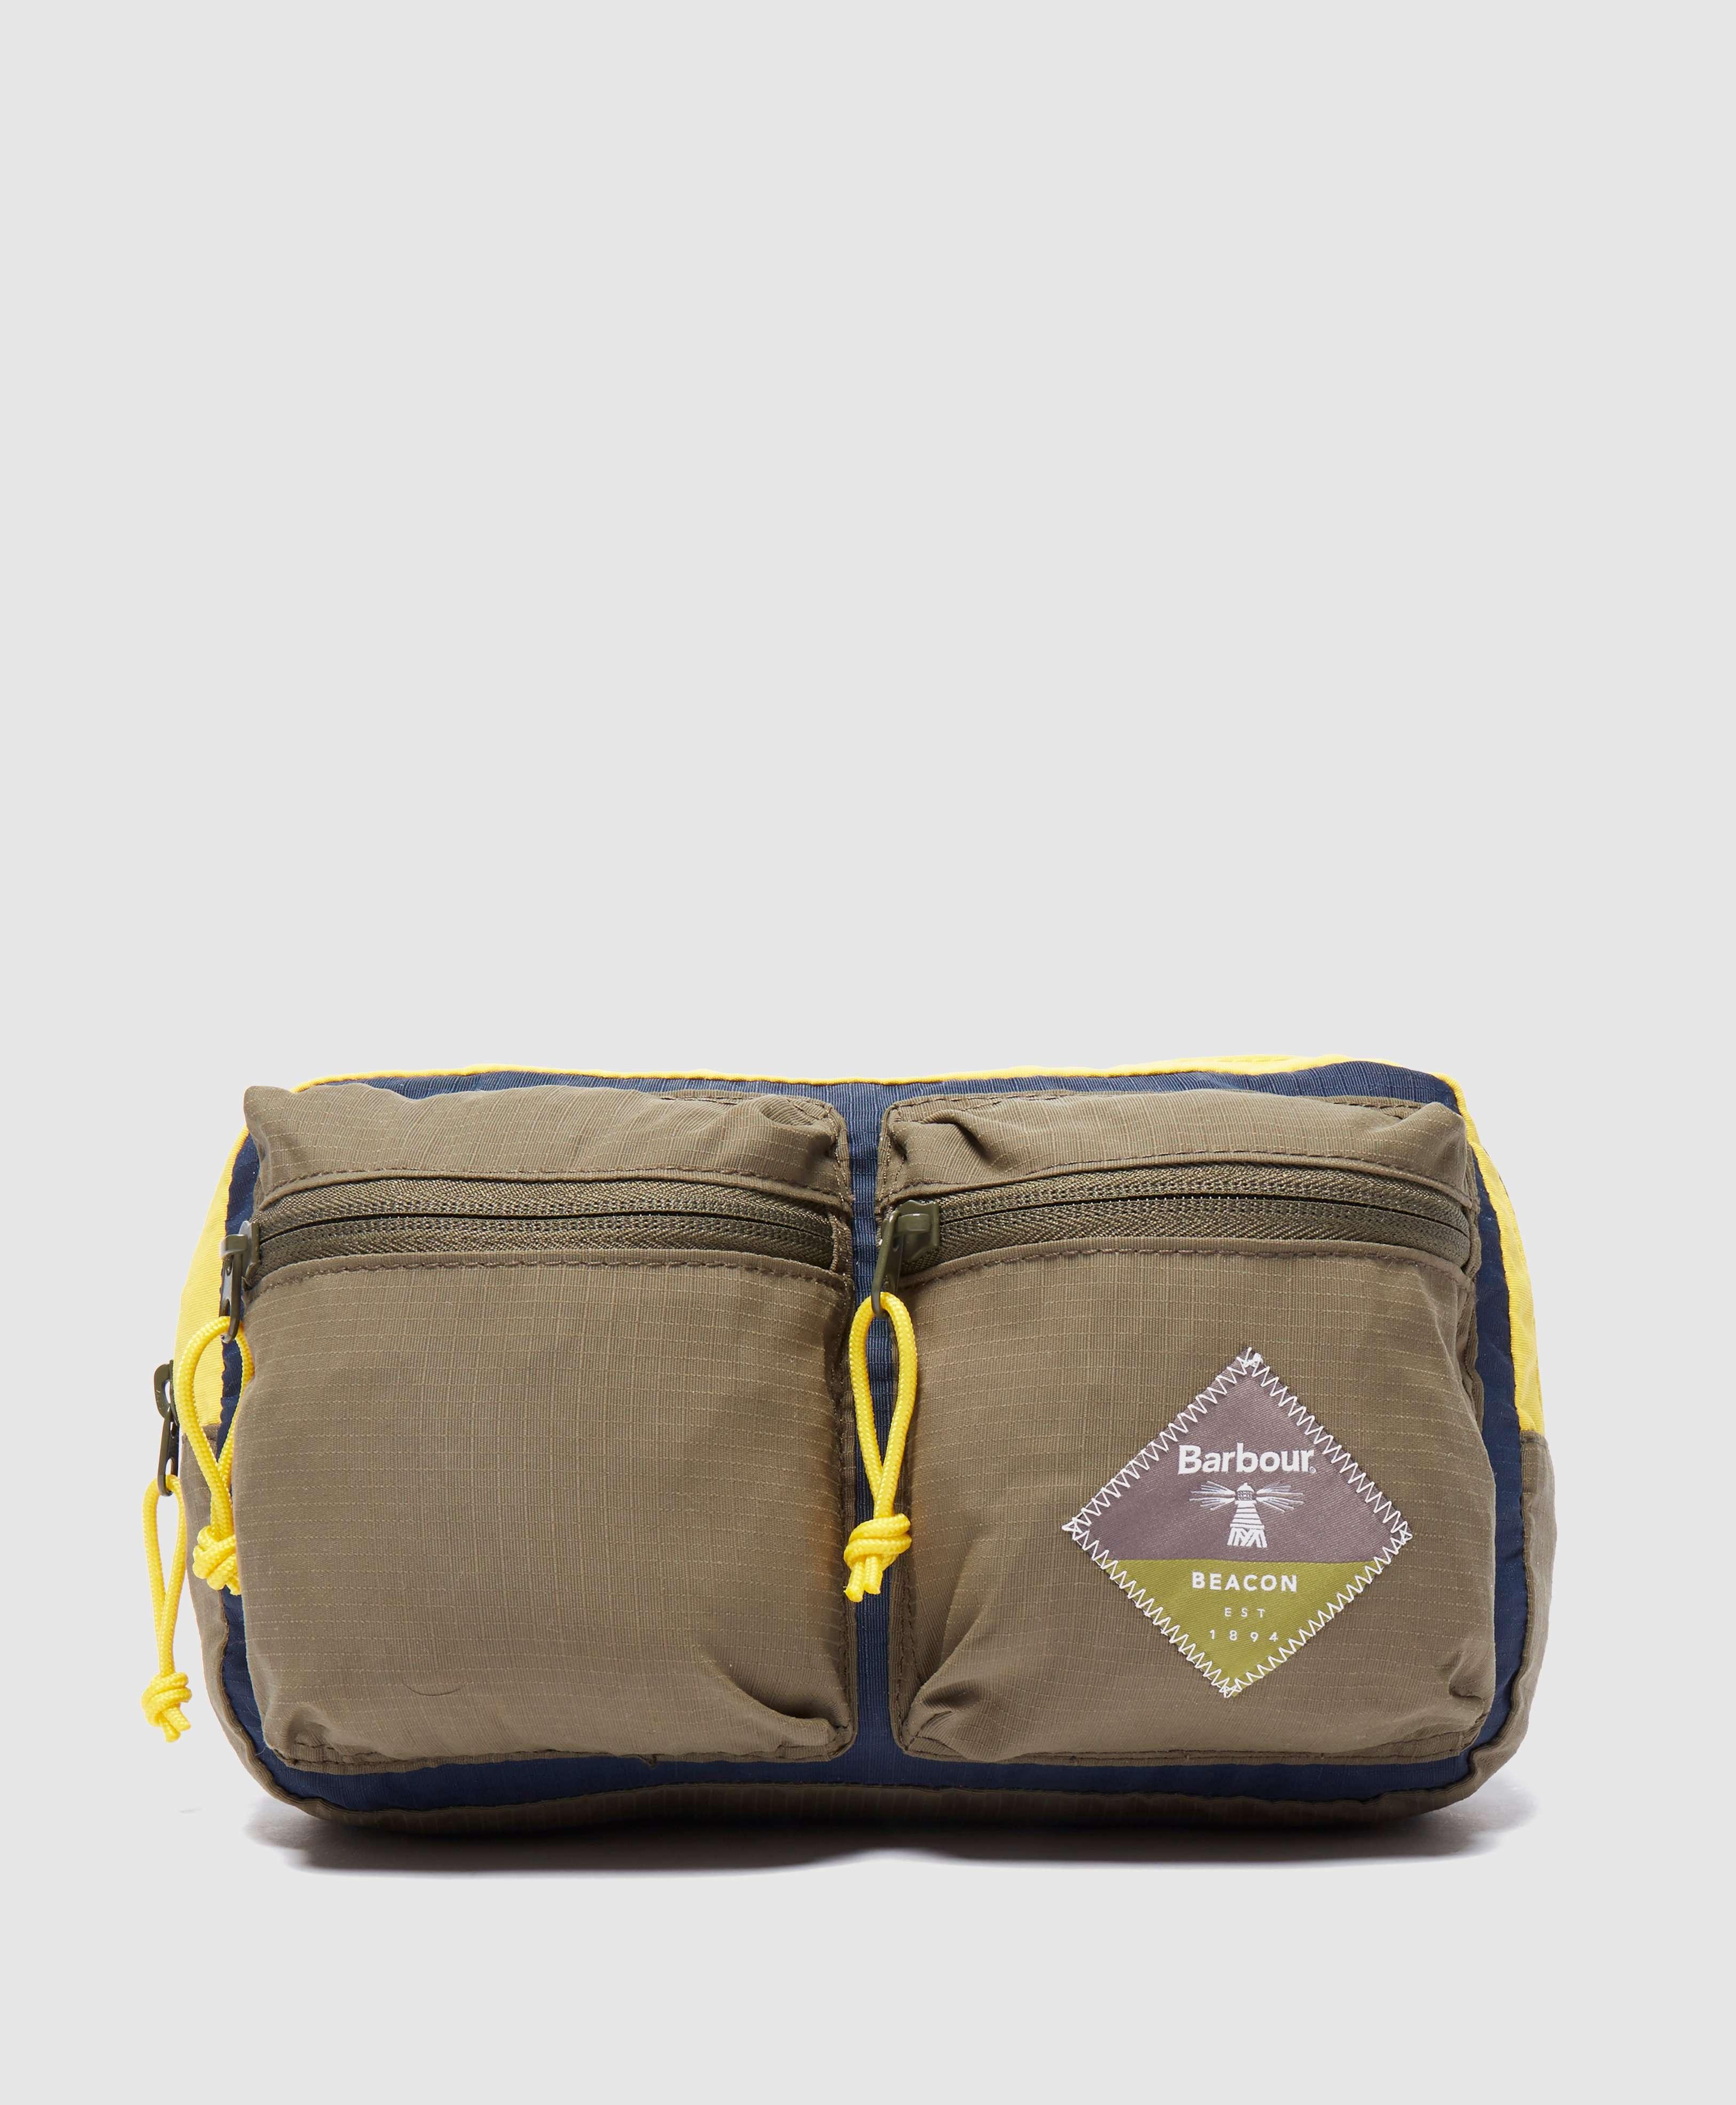 Barbour Beacon Sling Bum Bag